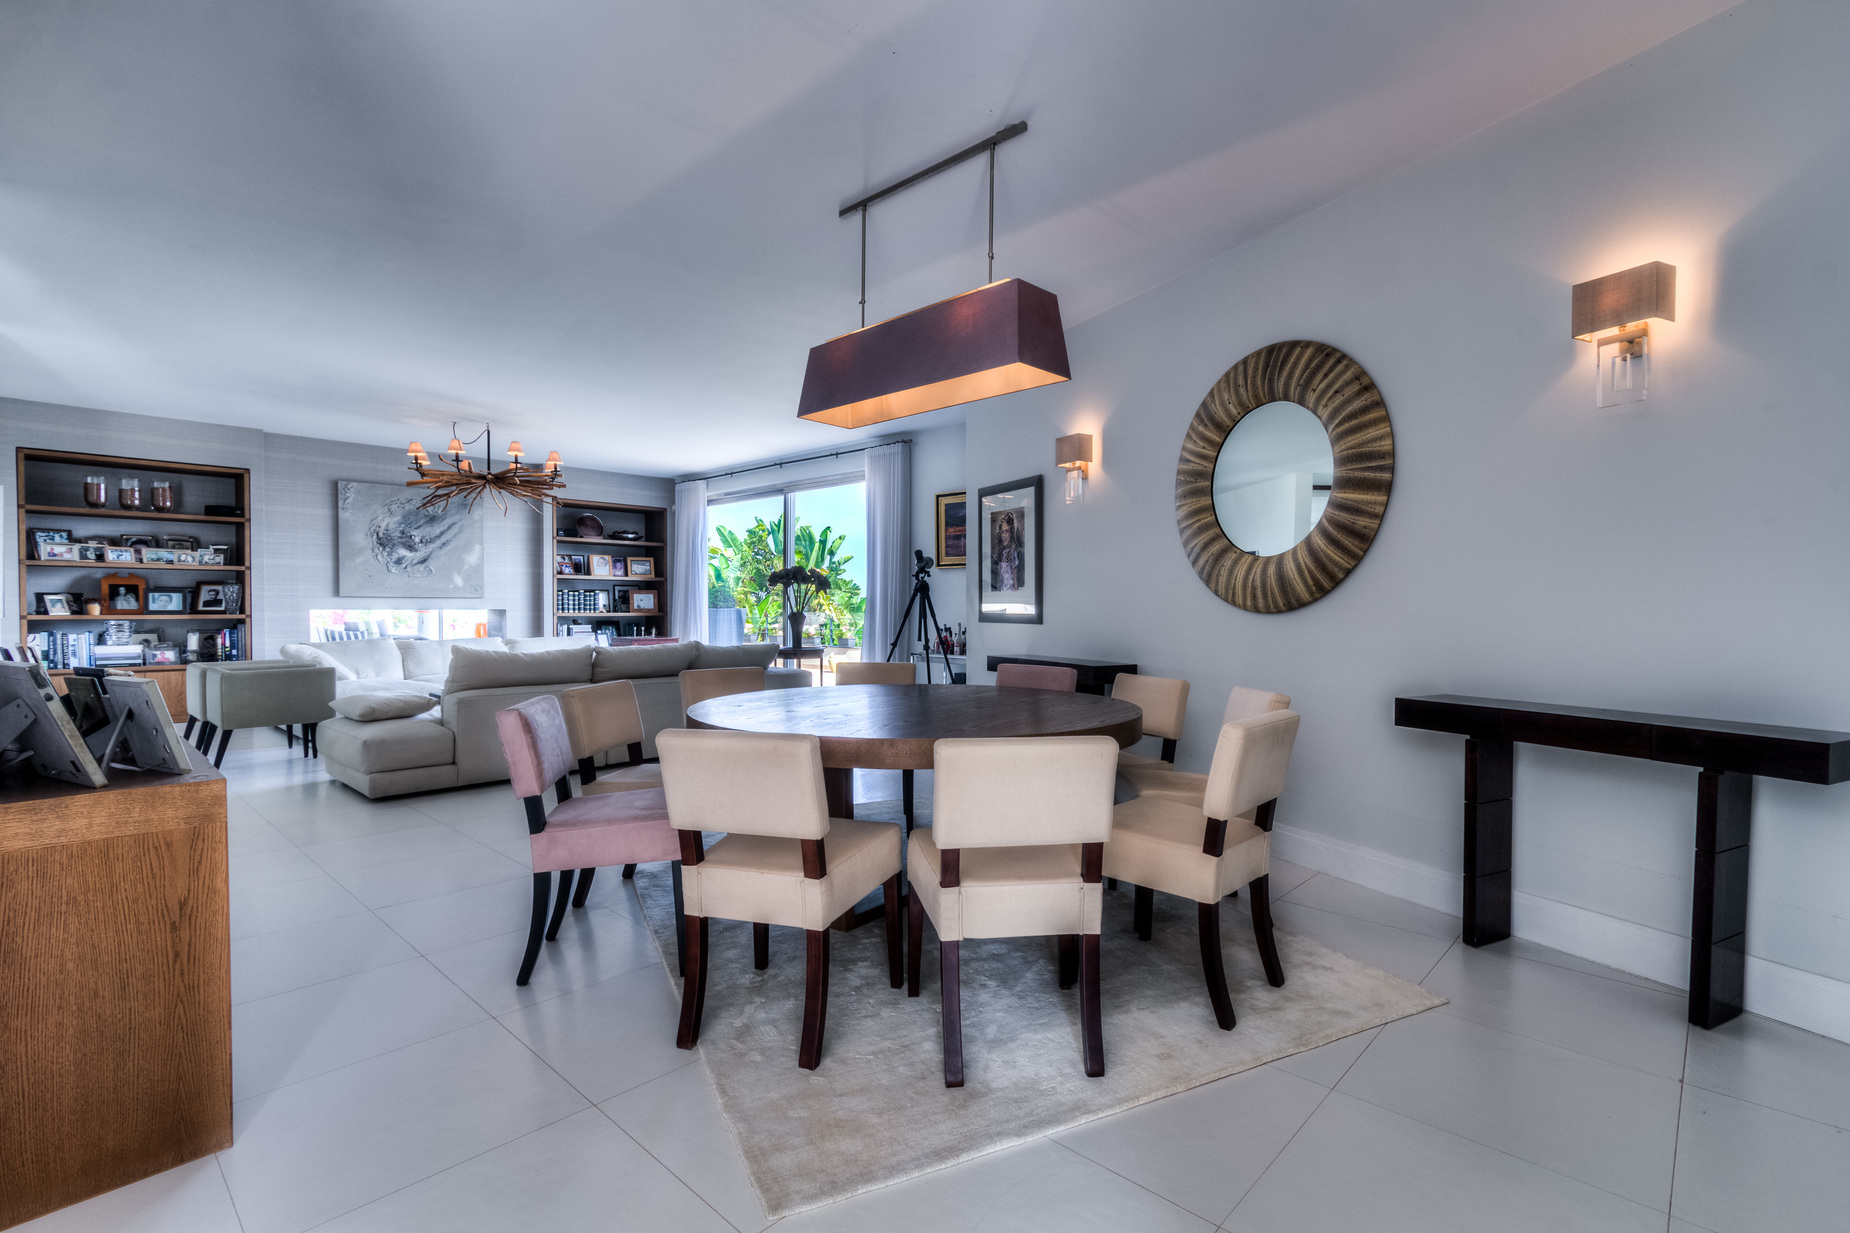 7 bed Villa For Sale in Bahar ic-Caghaq, Bahar ic-Caghaq - thumb 21